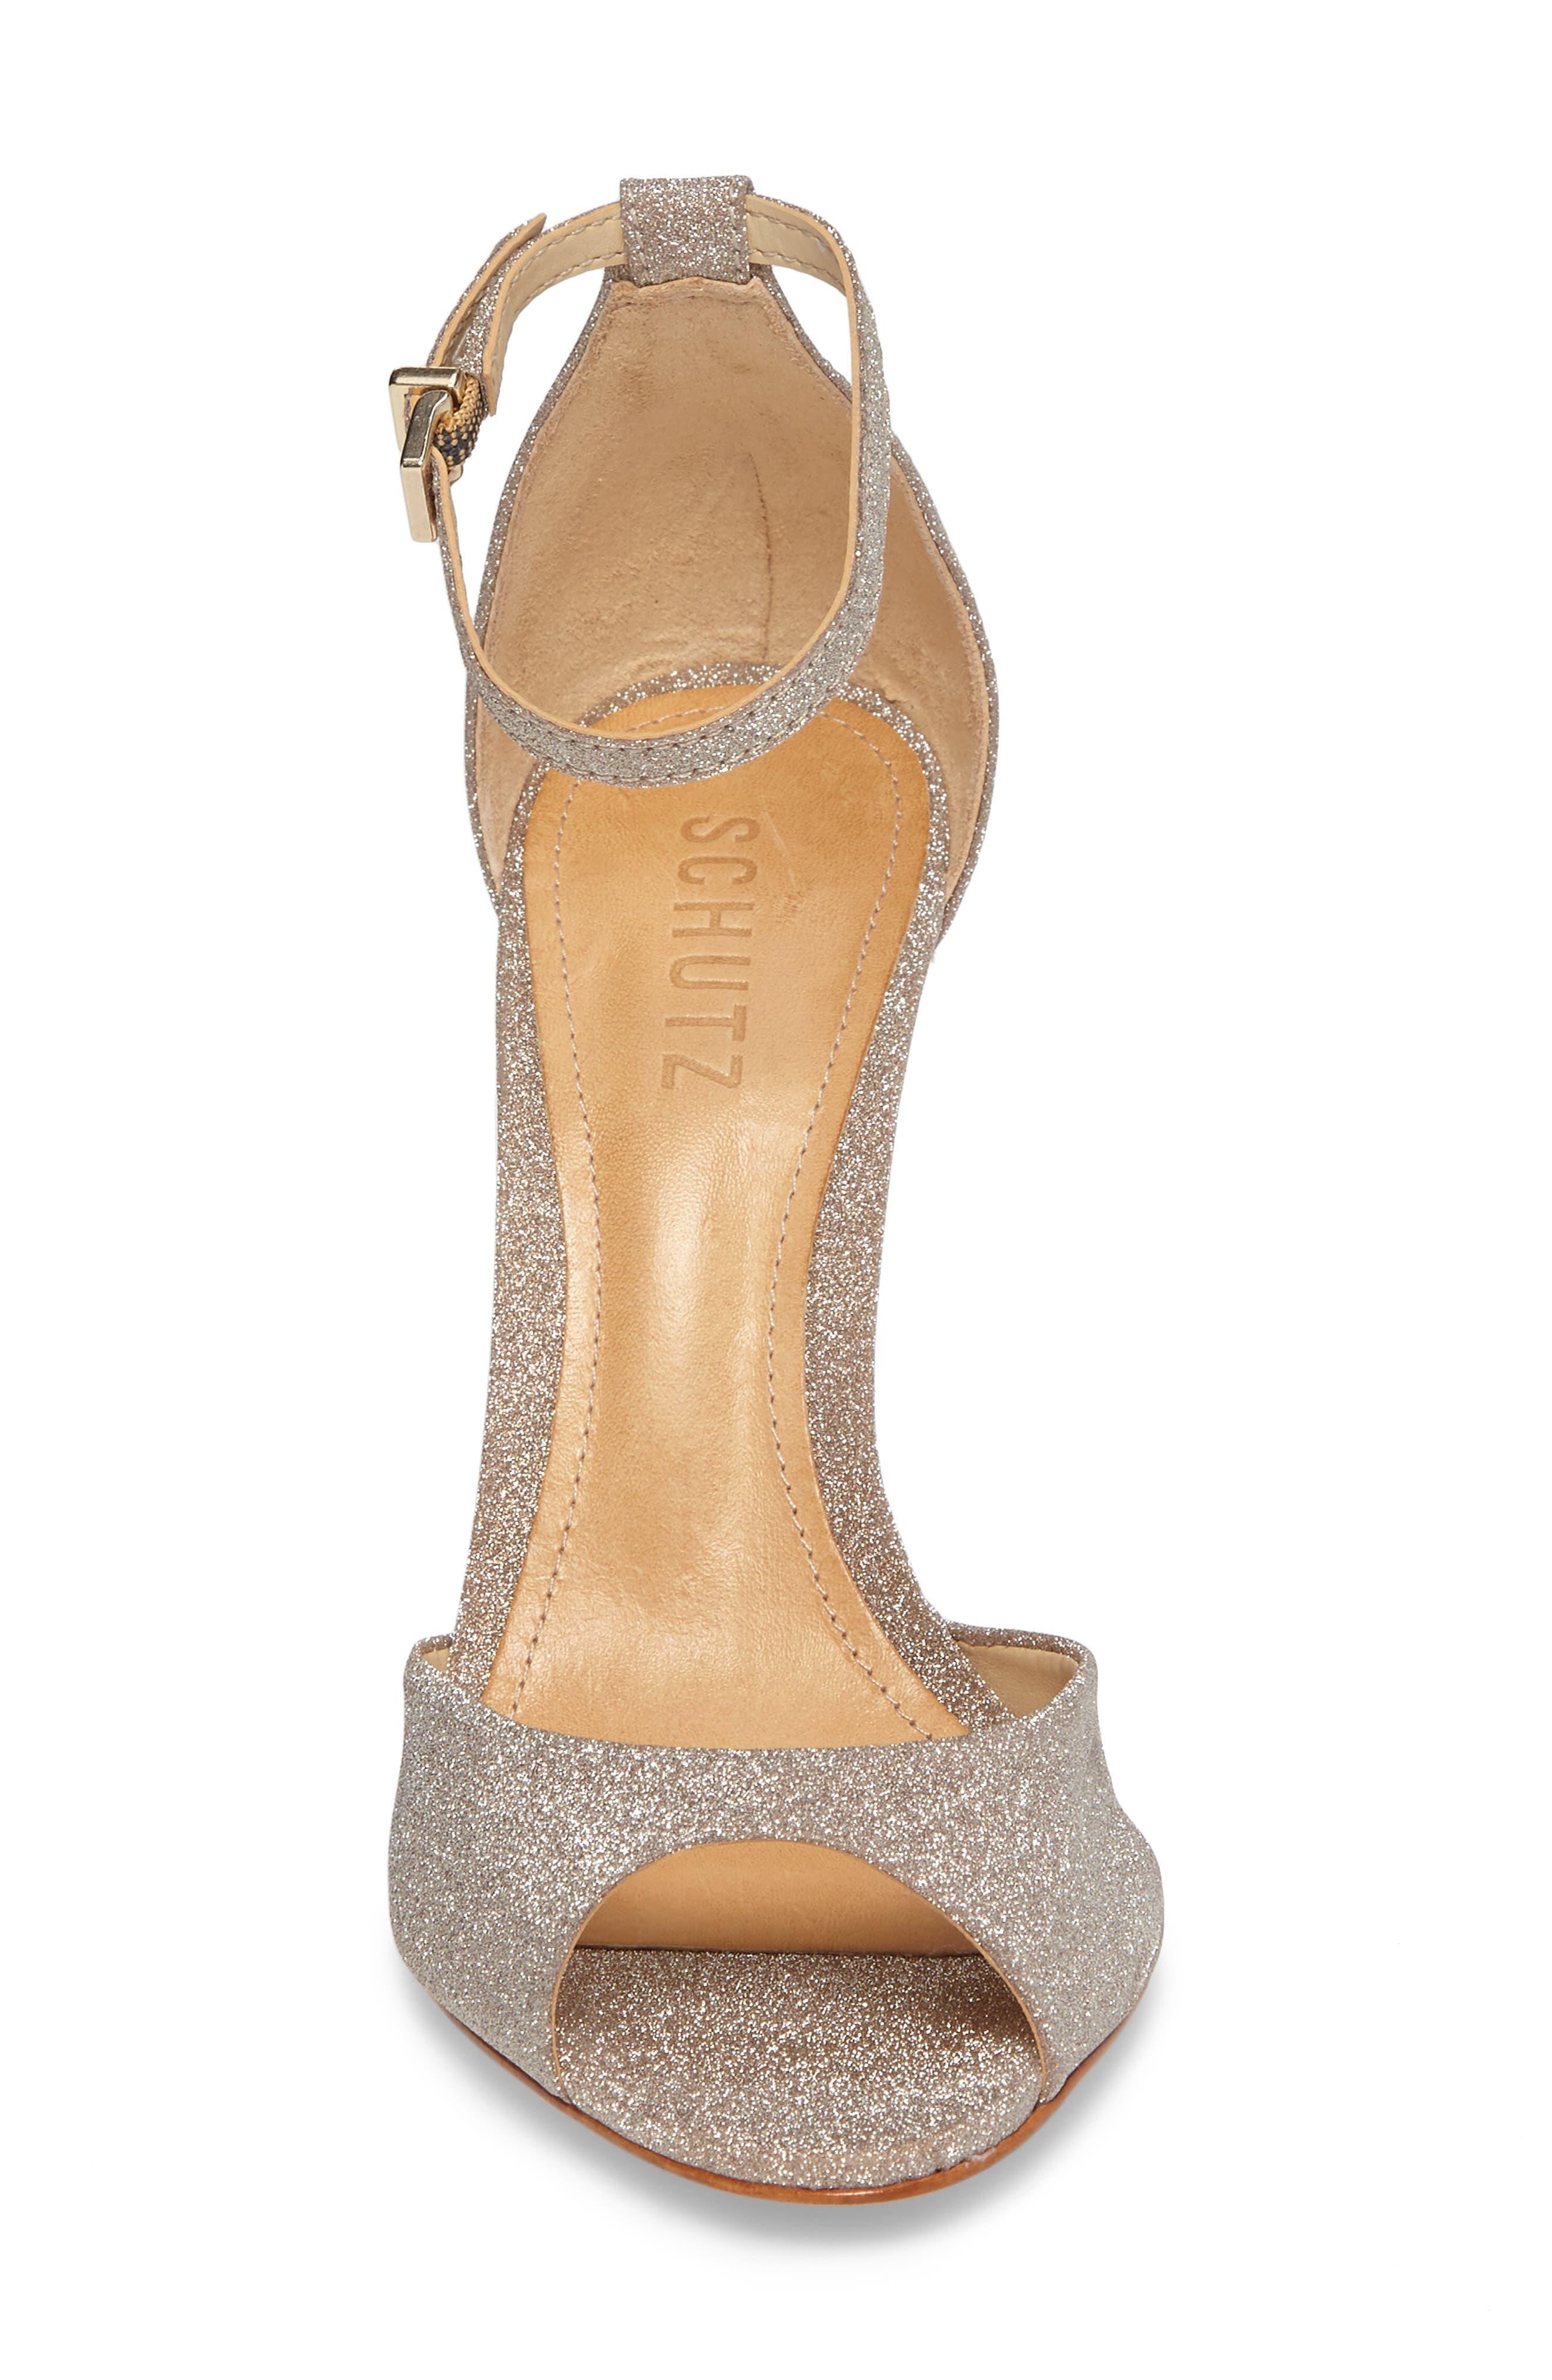 Saasha Lee Ankle Strap Sandal,                             Alternate thumbnail 4, color,                             040